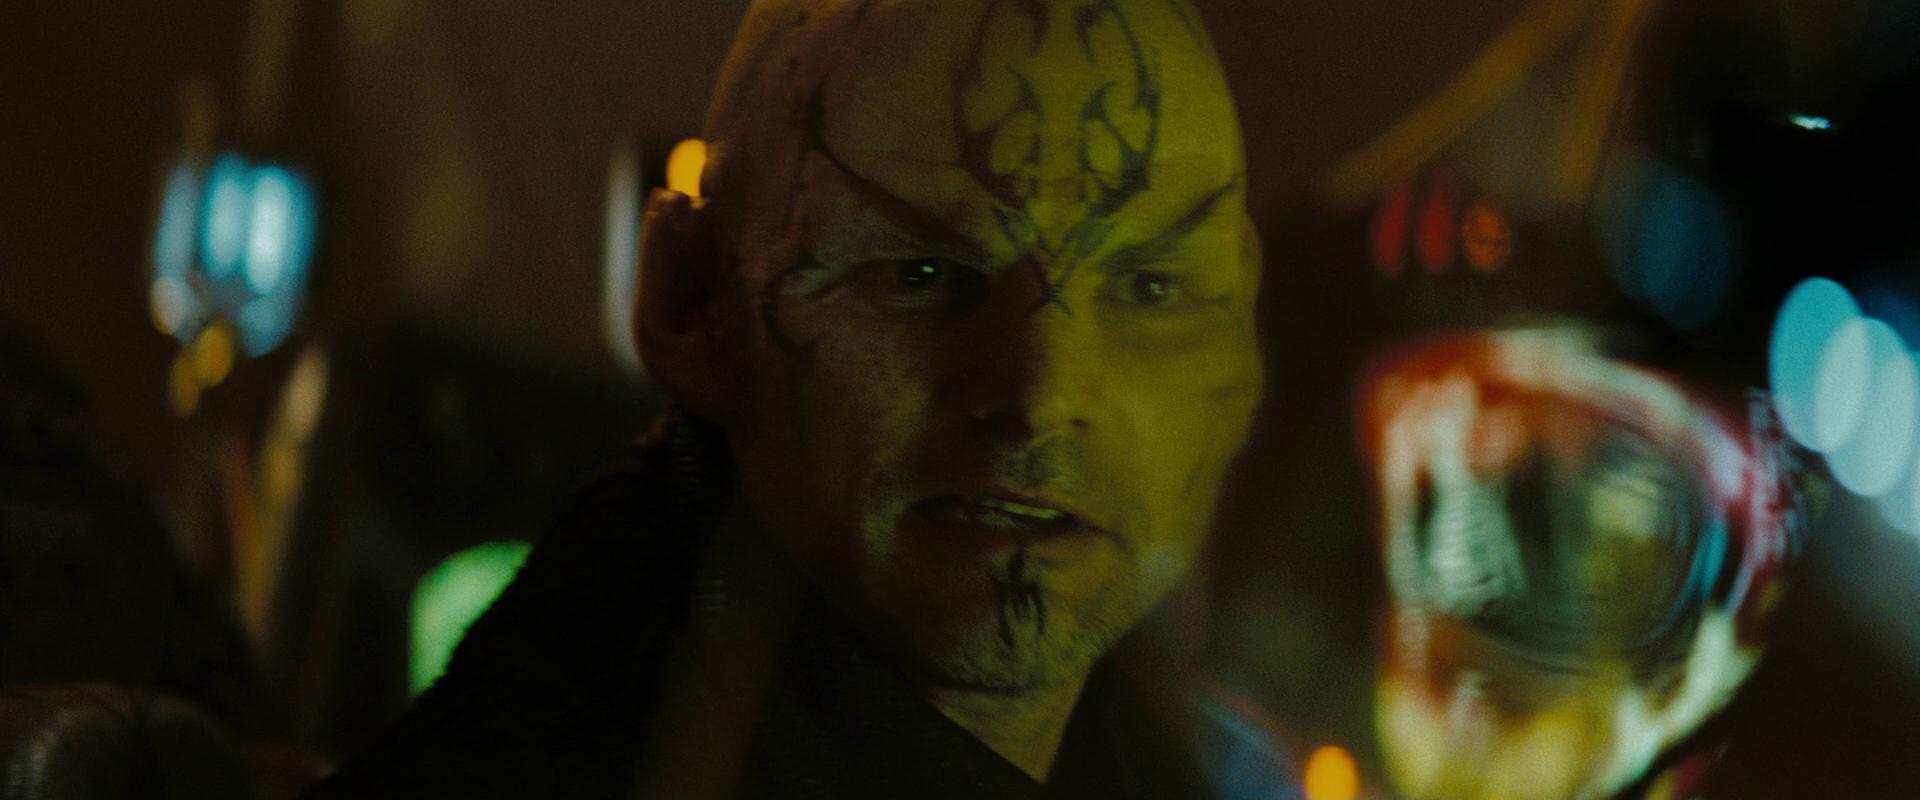 Звездный путь / Star Trek (2009) BDRip 1080p